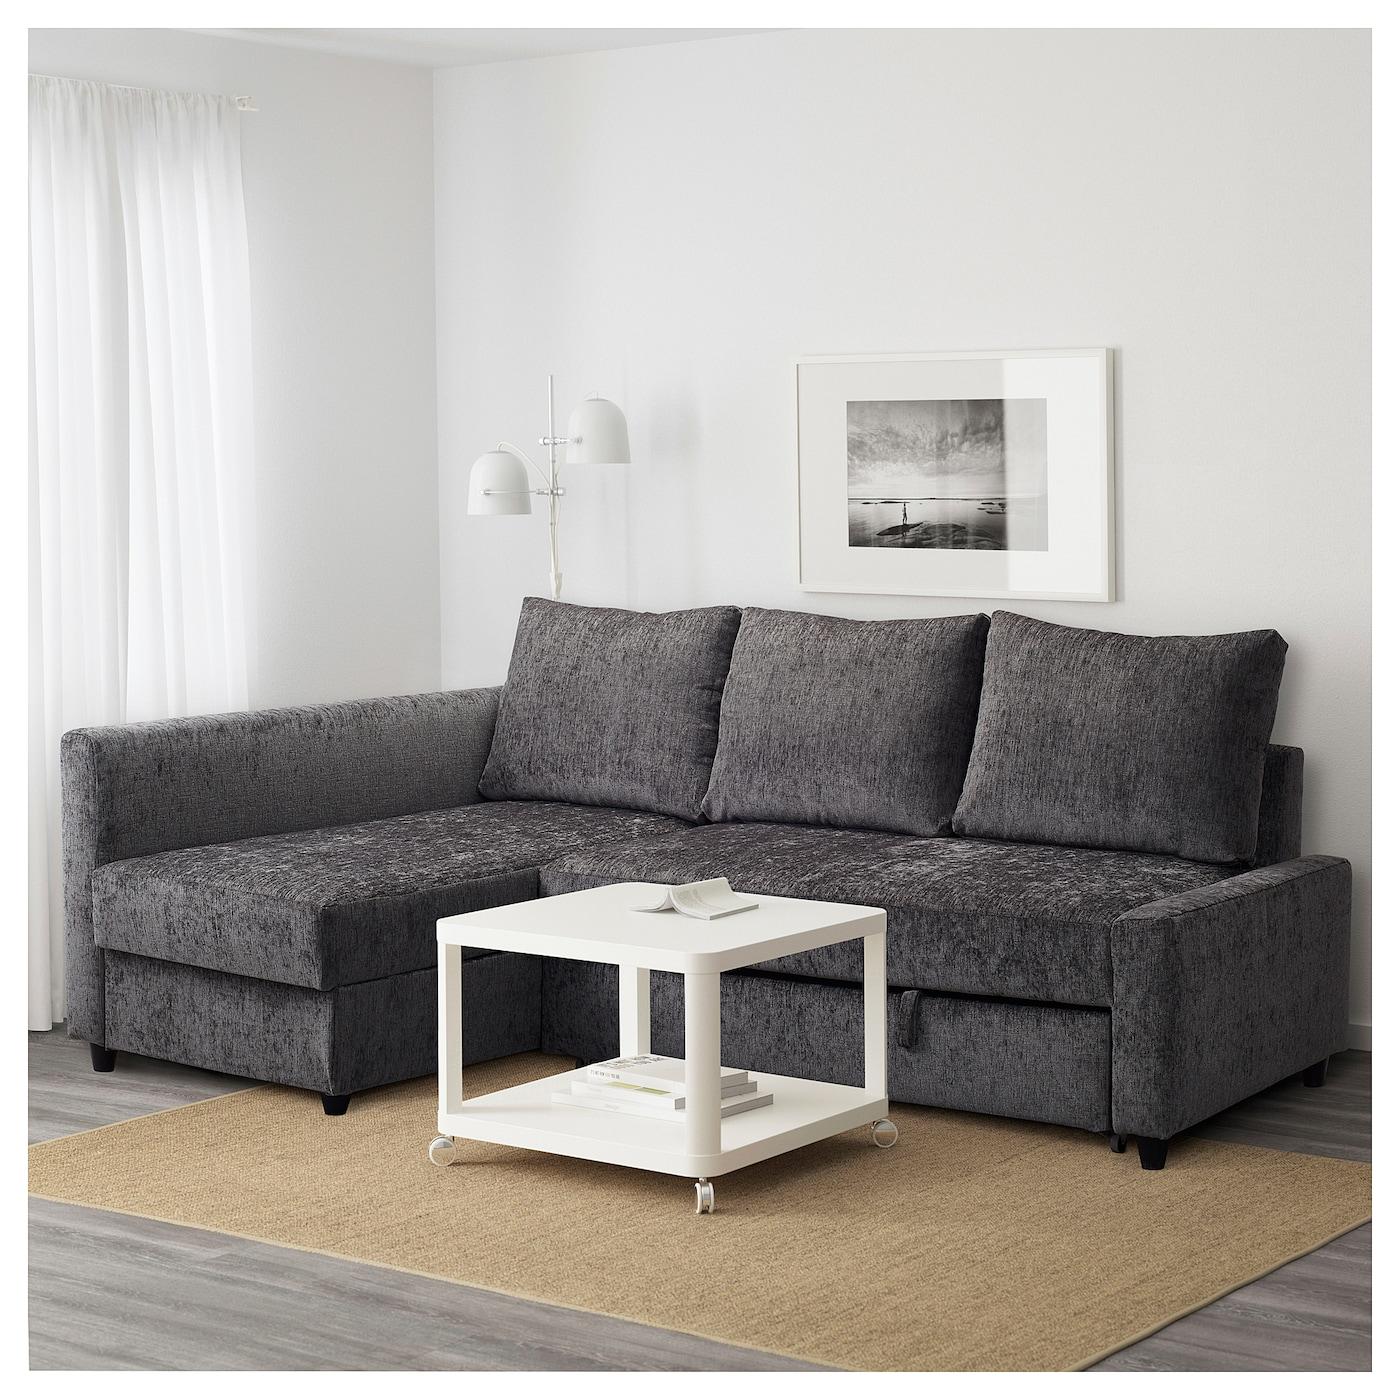 FRIHETEN Corner sofa bed with storage Dark grey IKEA